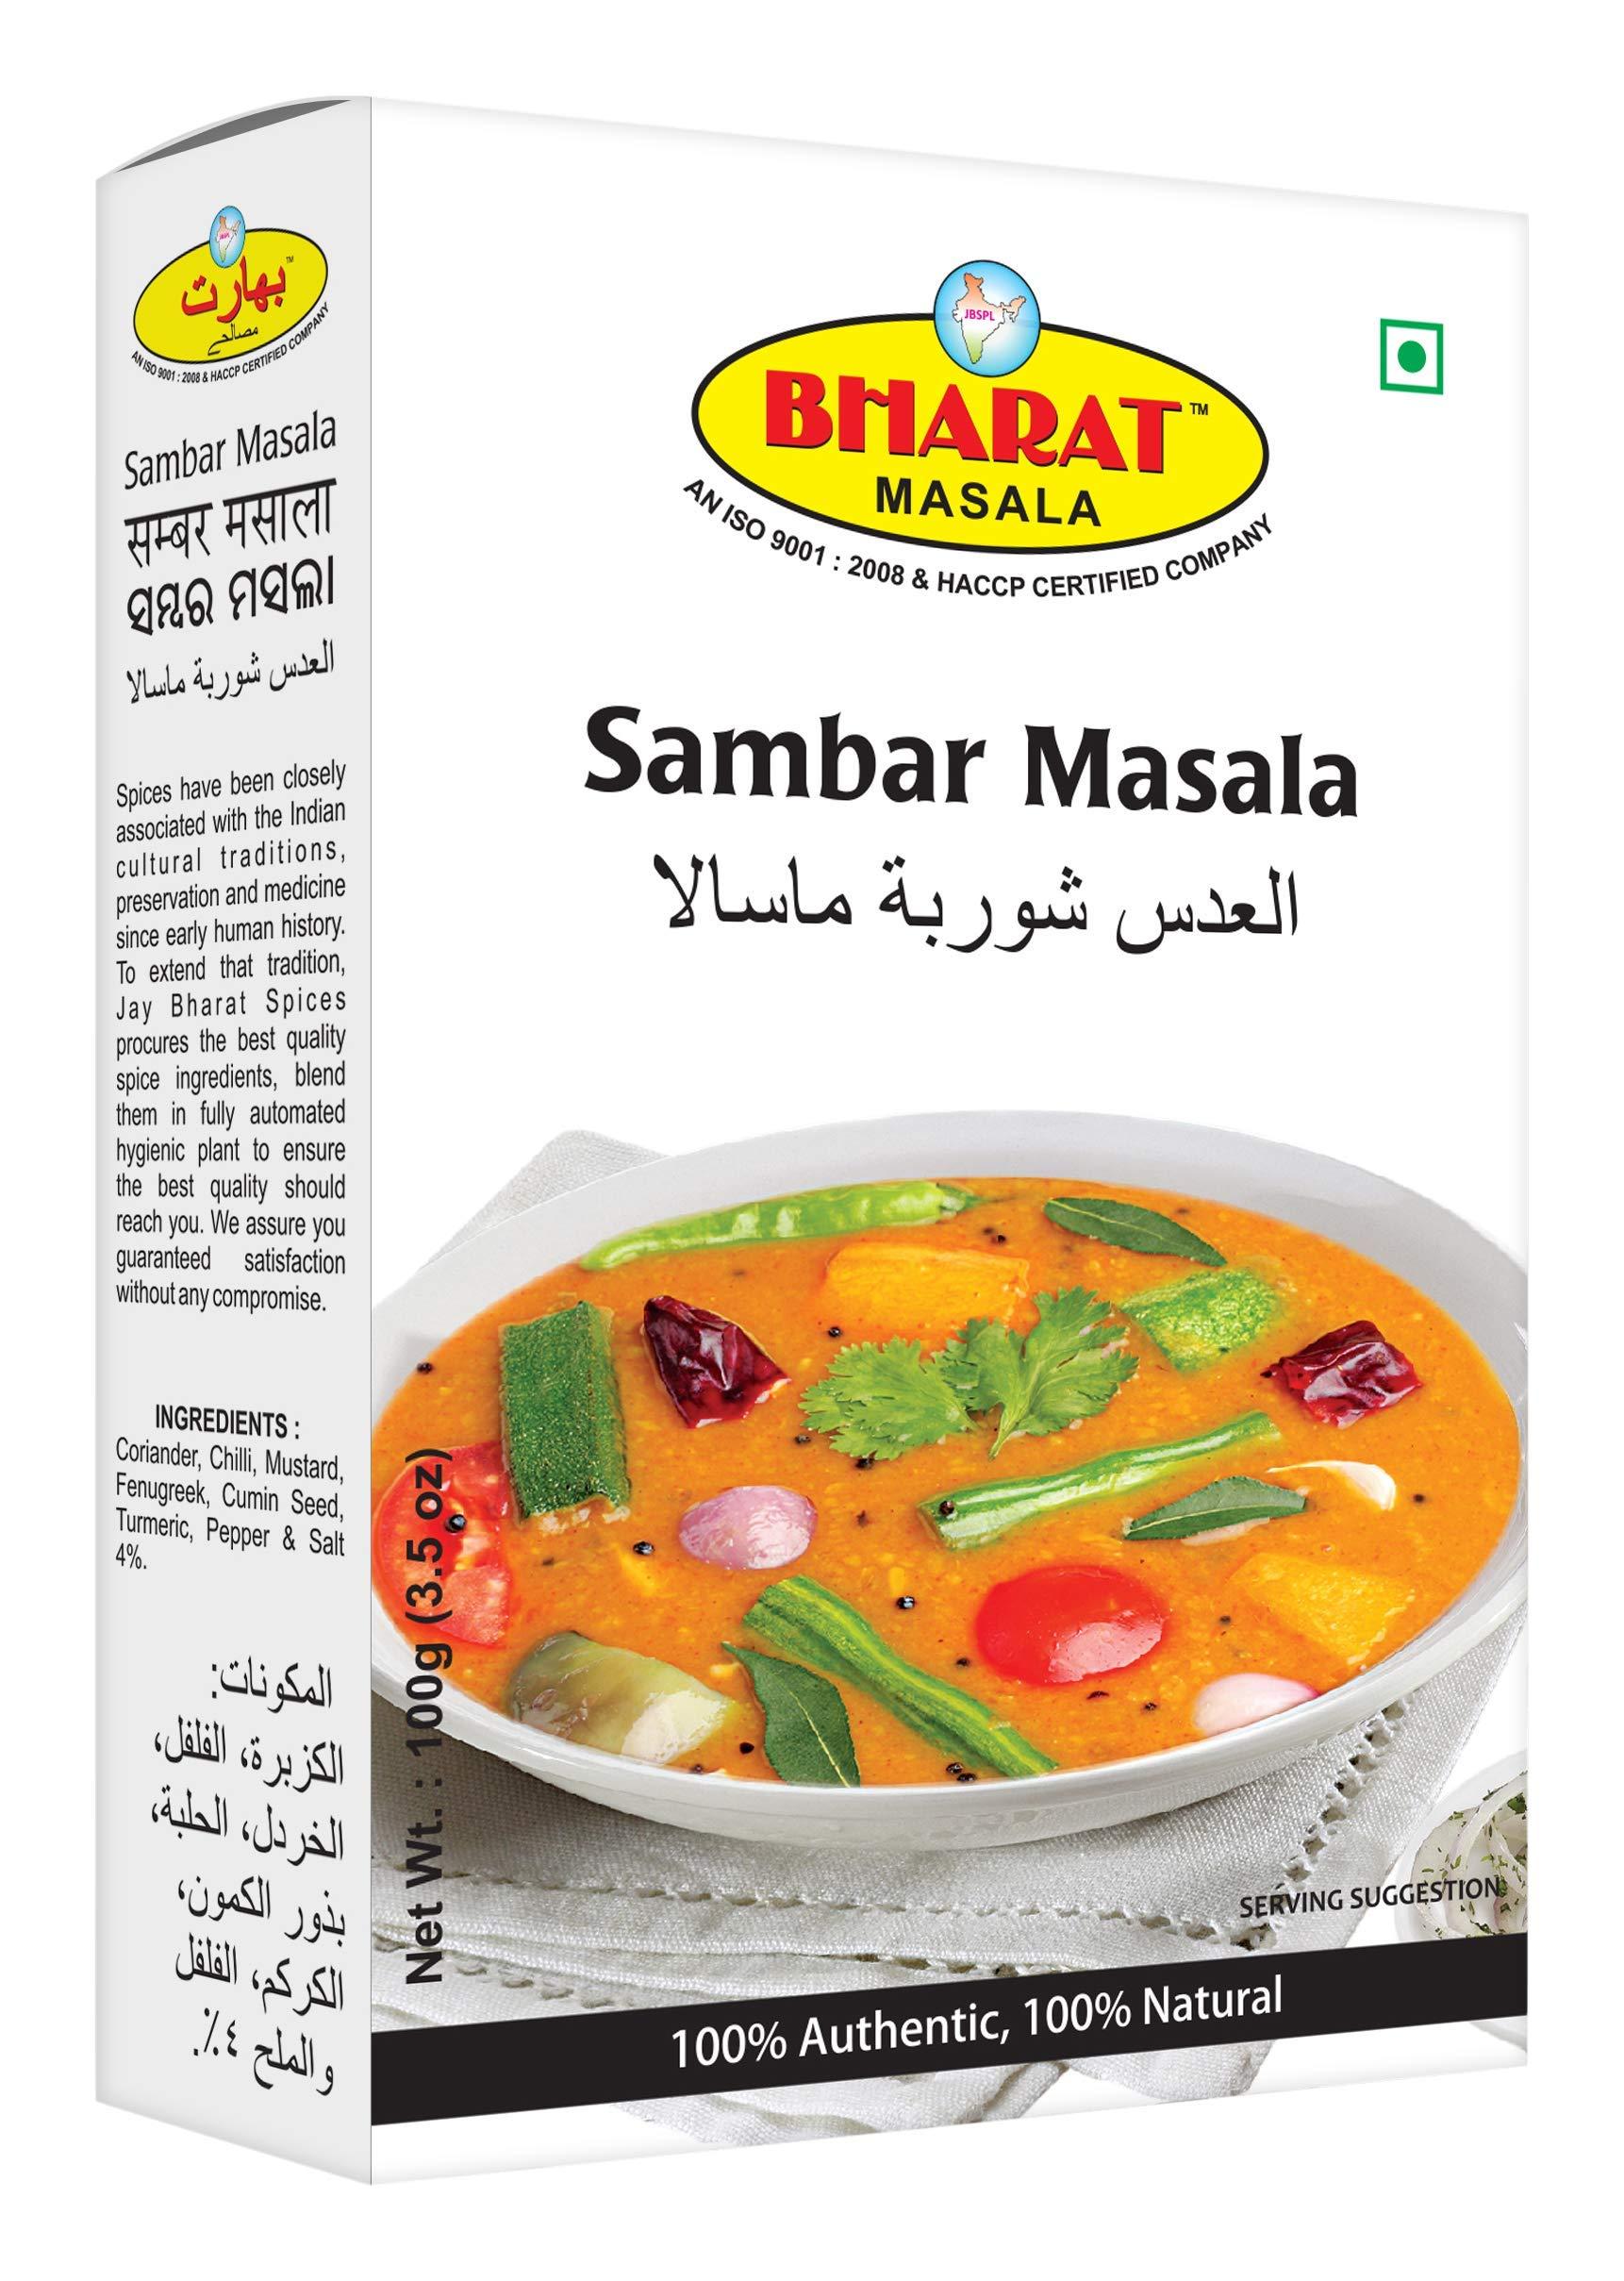 BHARAT MASALA Sambar Powder, 100 Grams